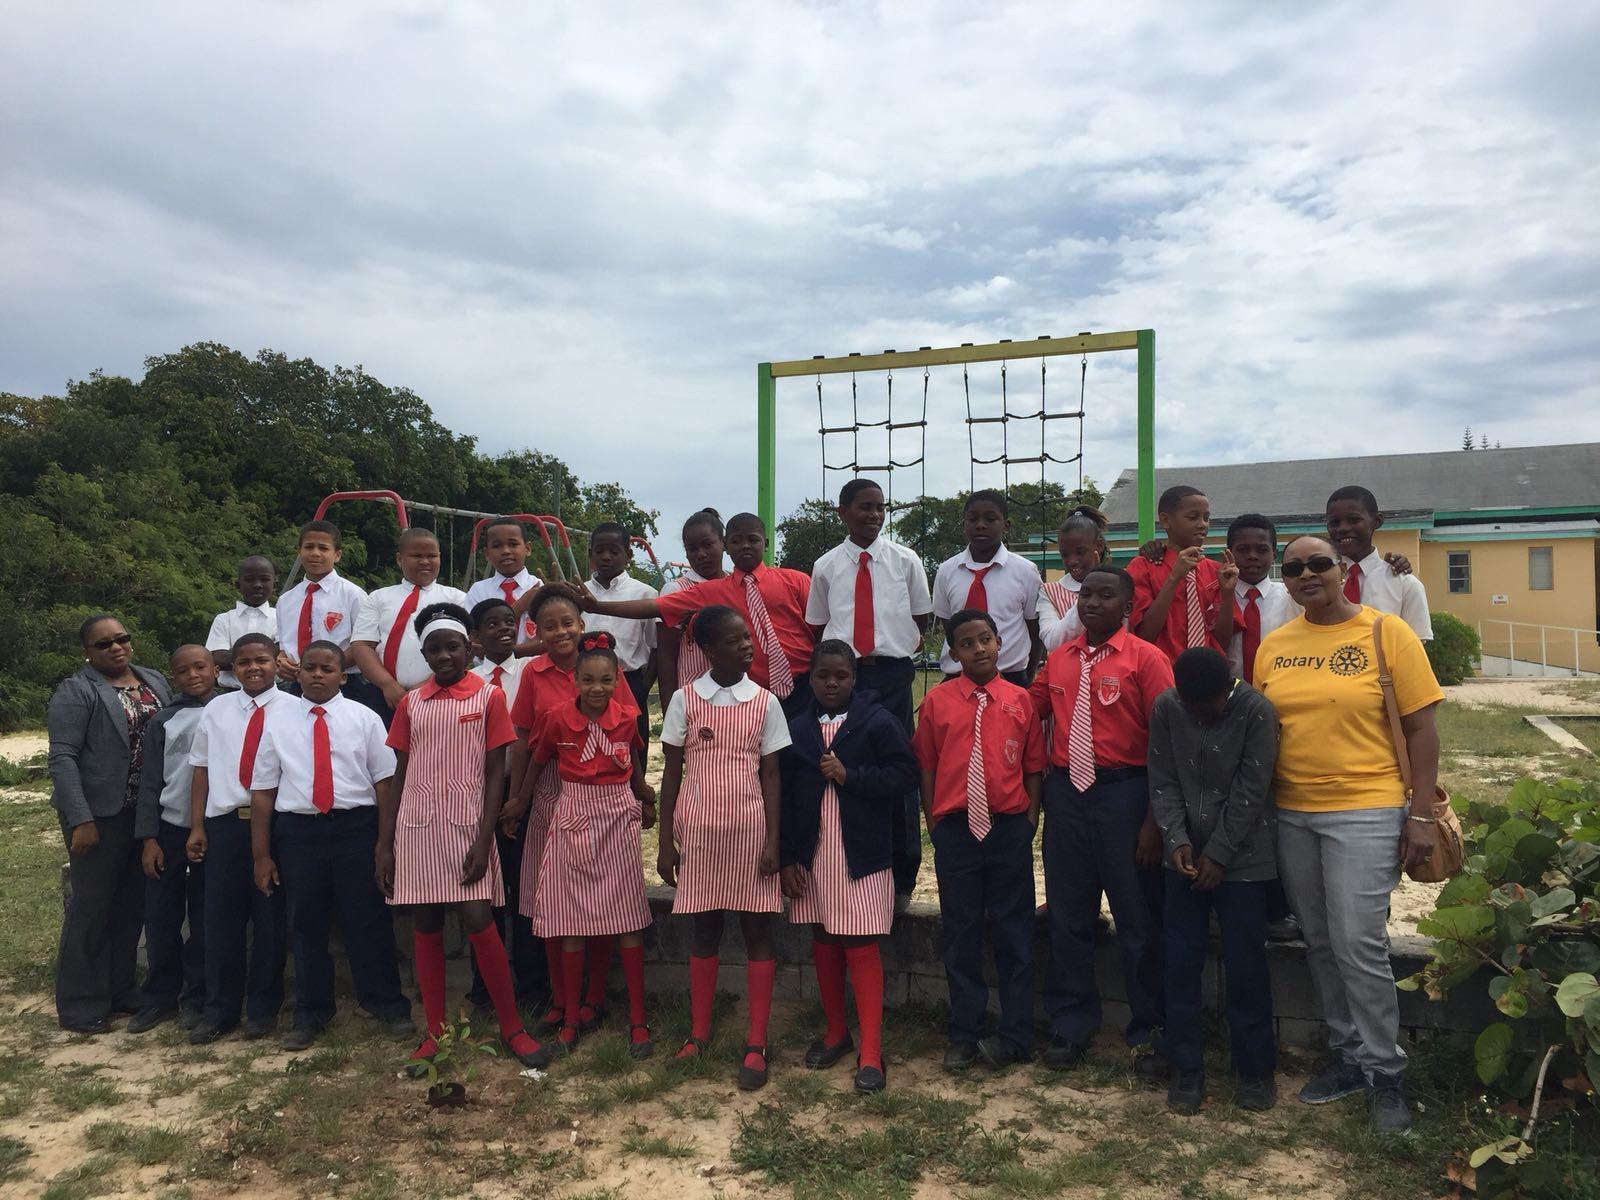 Stories | Rotary Club of Eleuthera